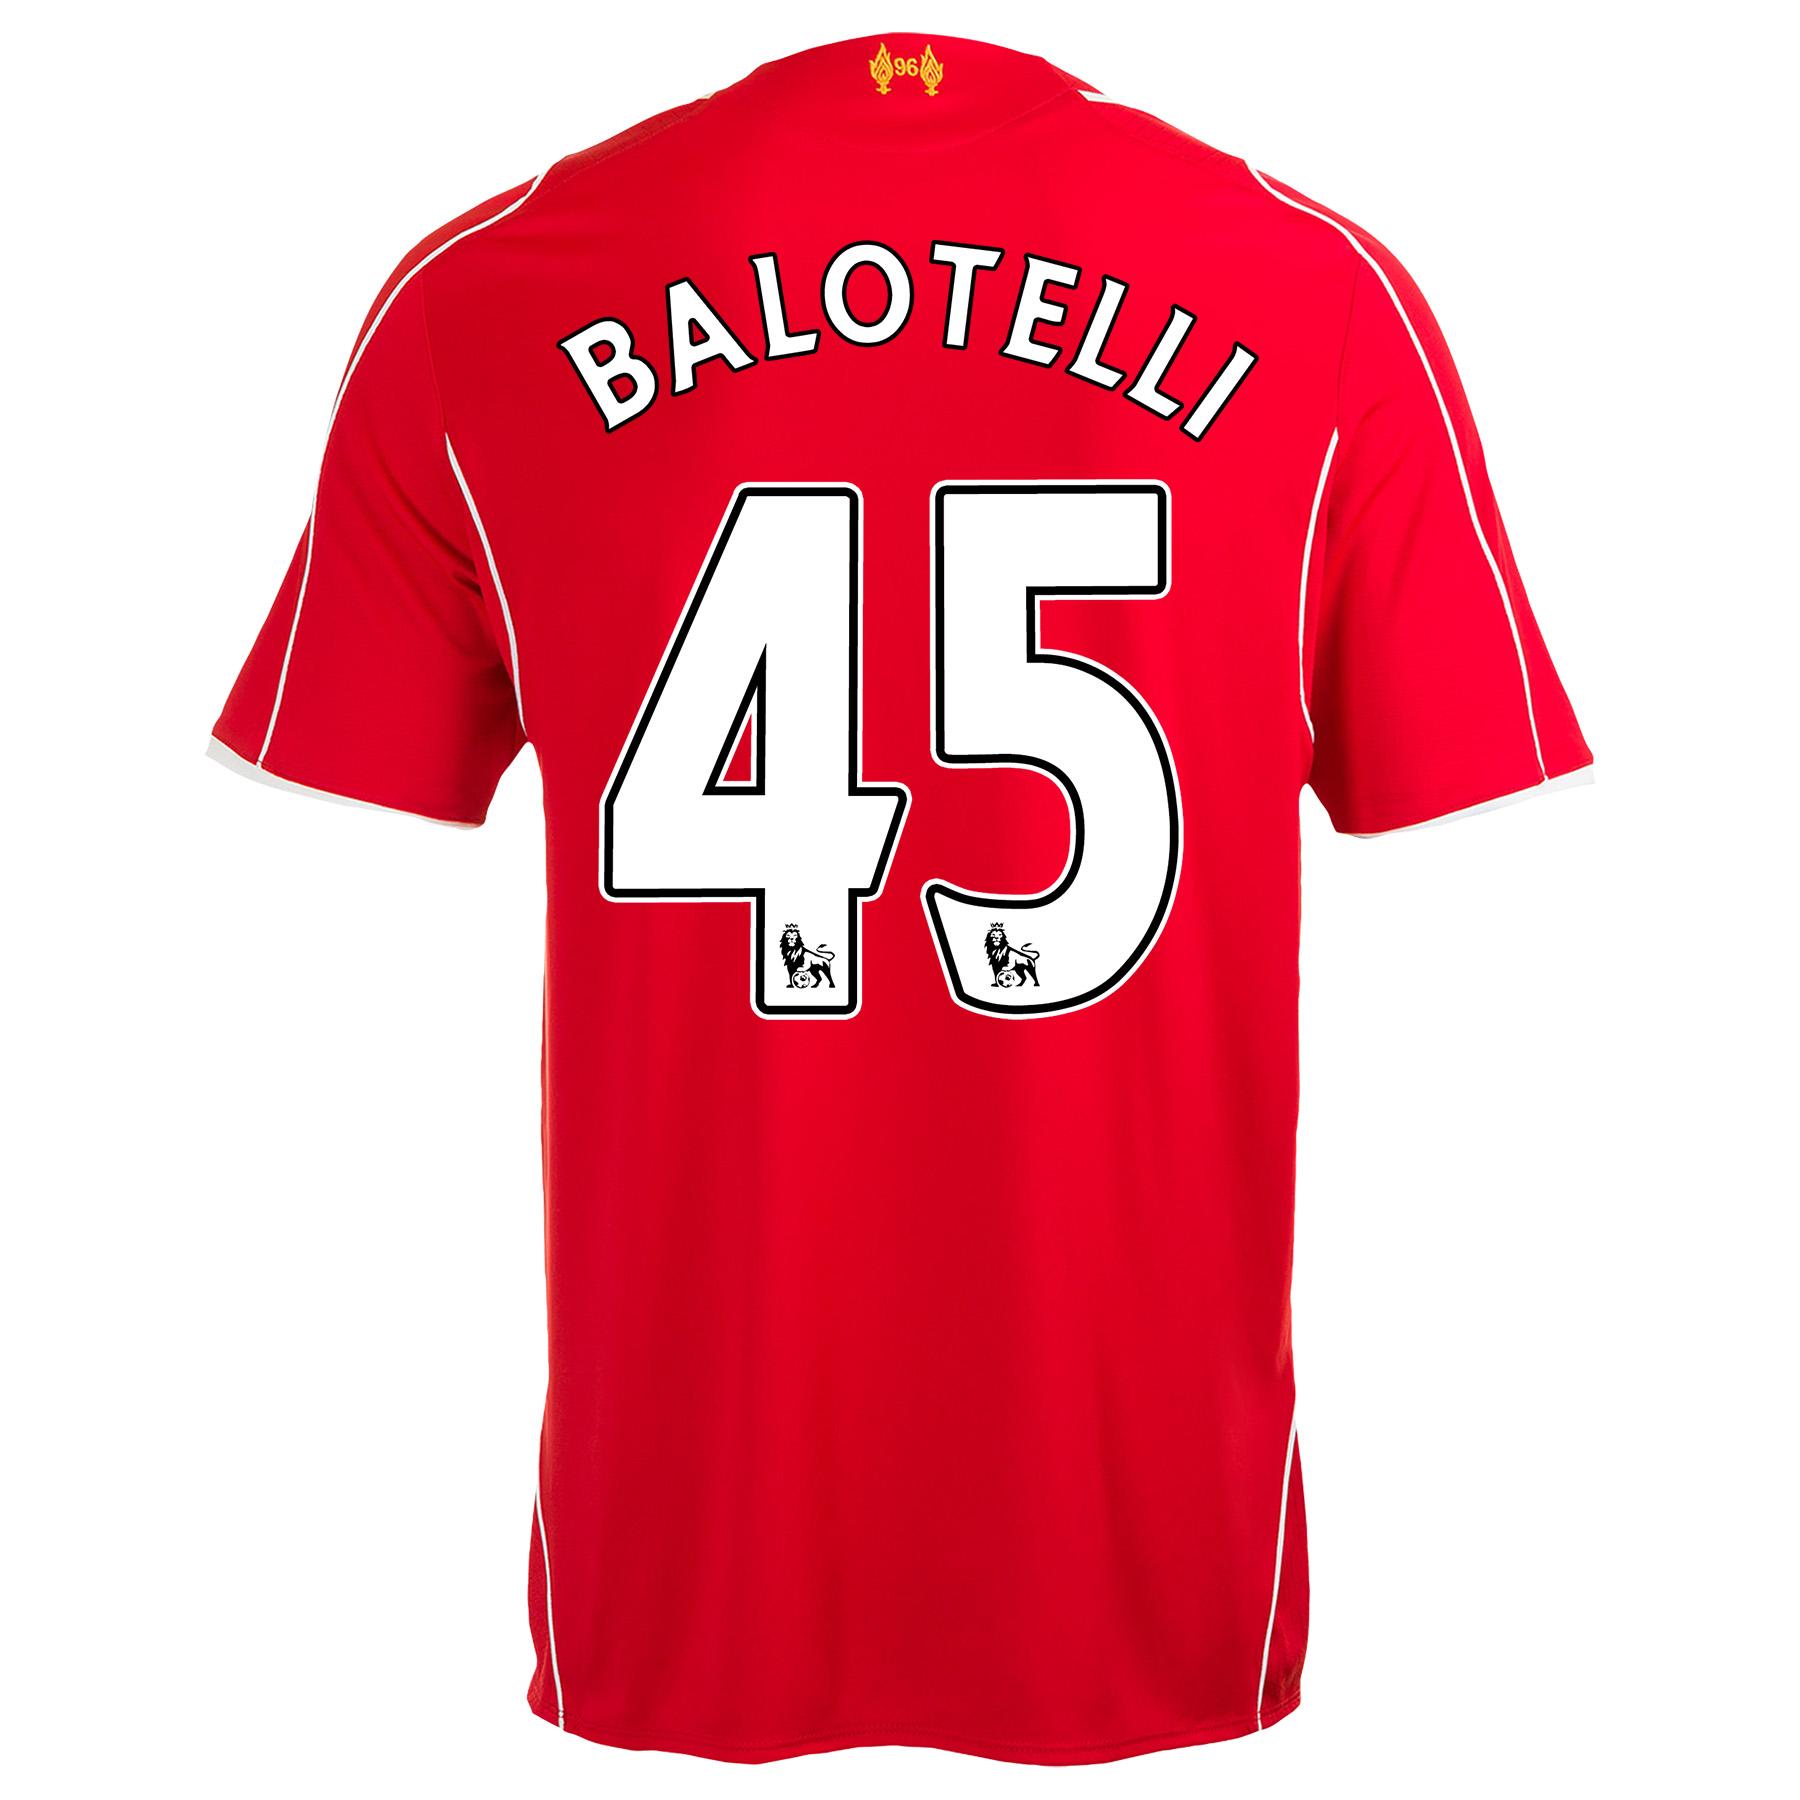 Liverpool Home Shirt 2014/15 Kids with Balotelli 45 printing